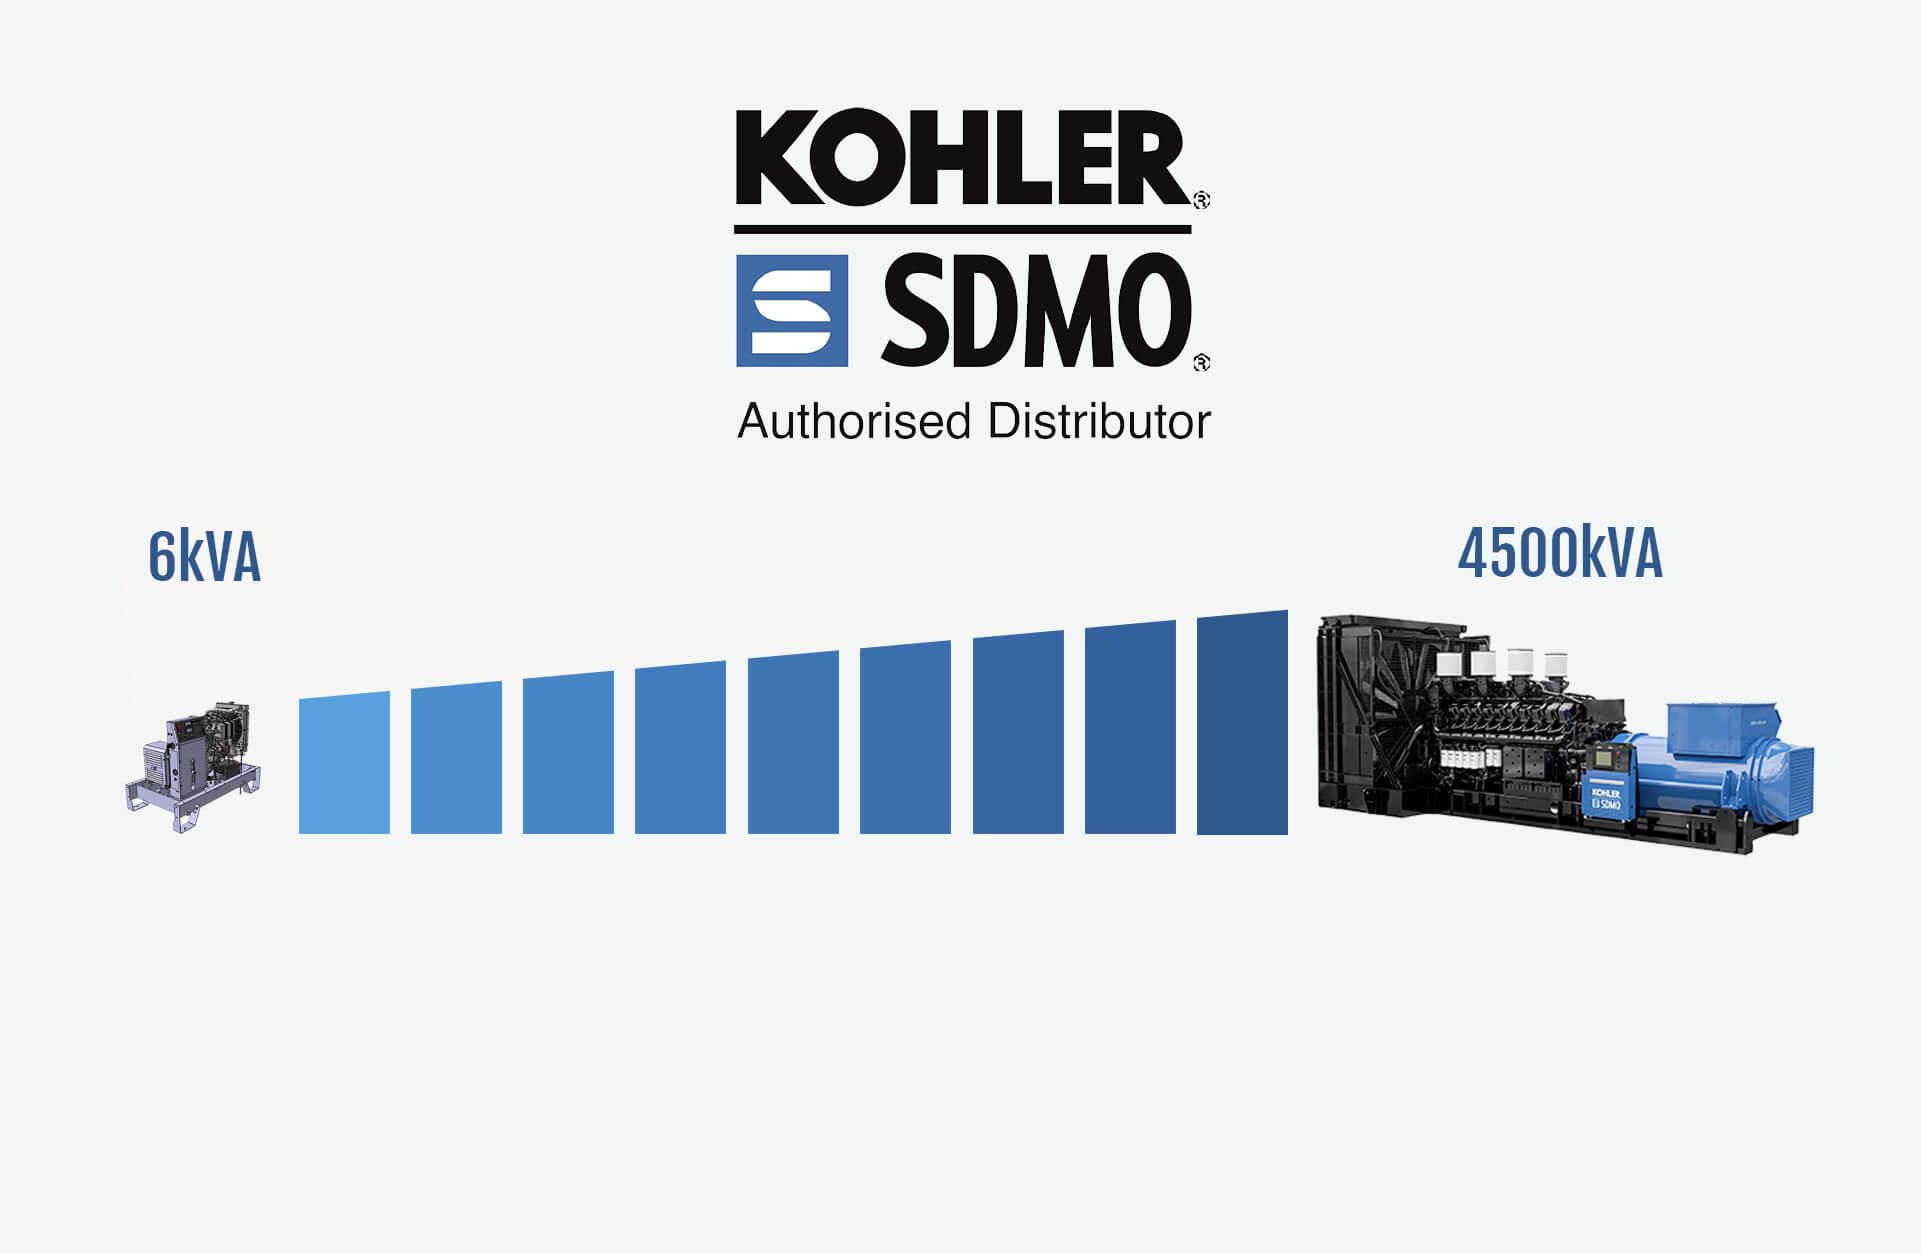 Kohler-SDMO Generator Range